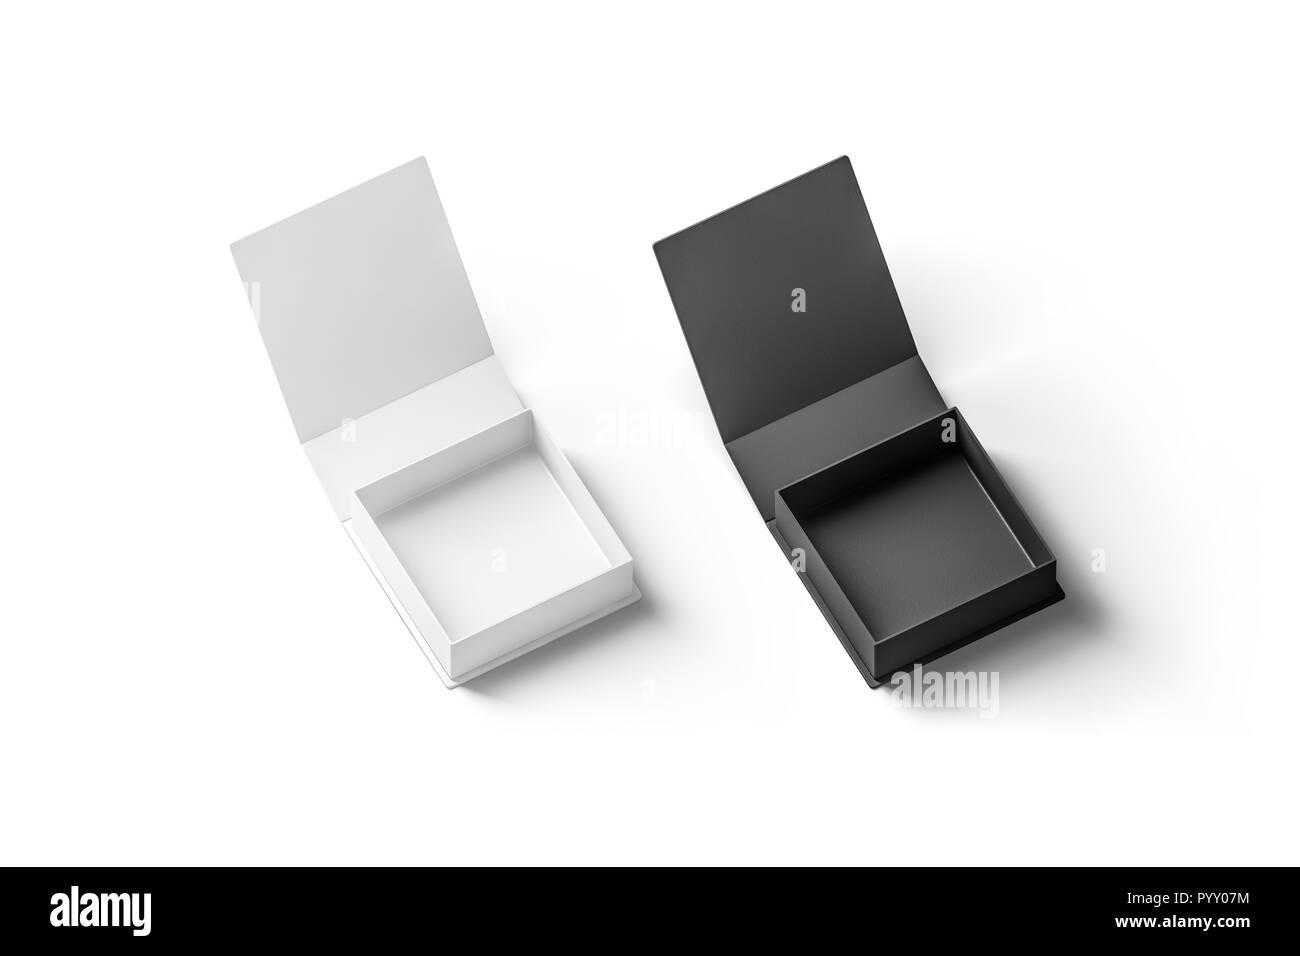 Blank Black And White Opened Gift Box Mockup Set Isolated 3d